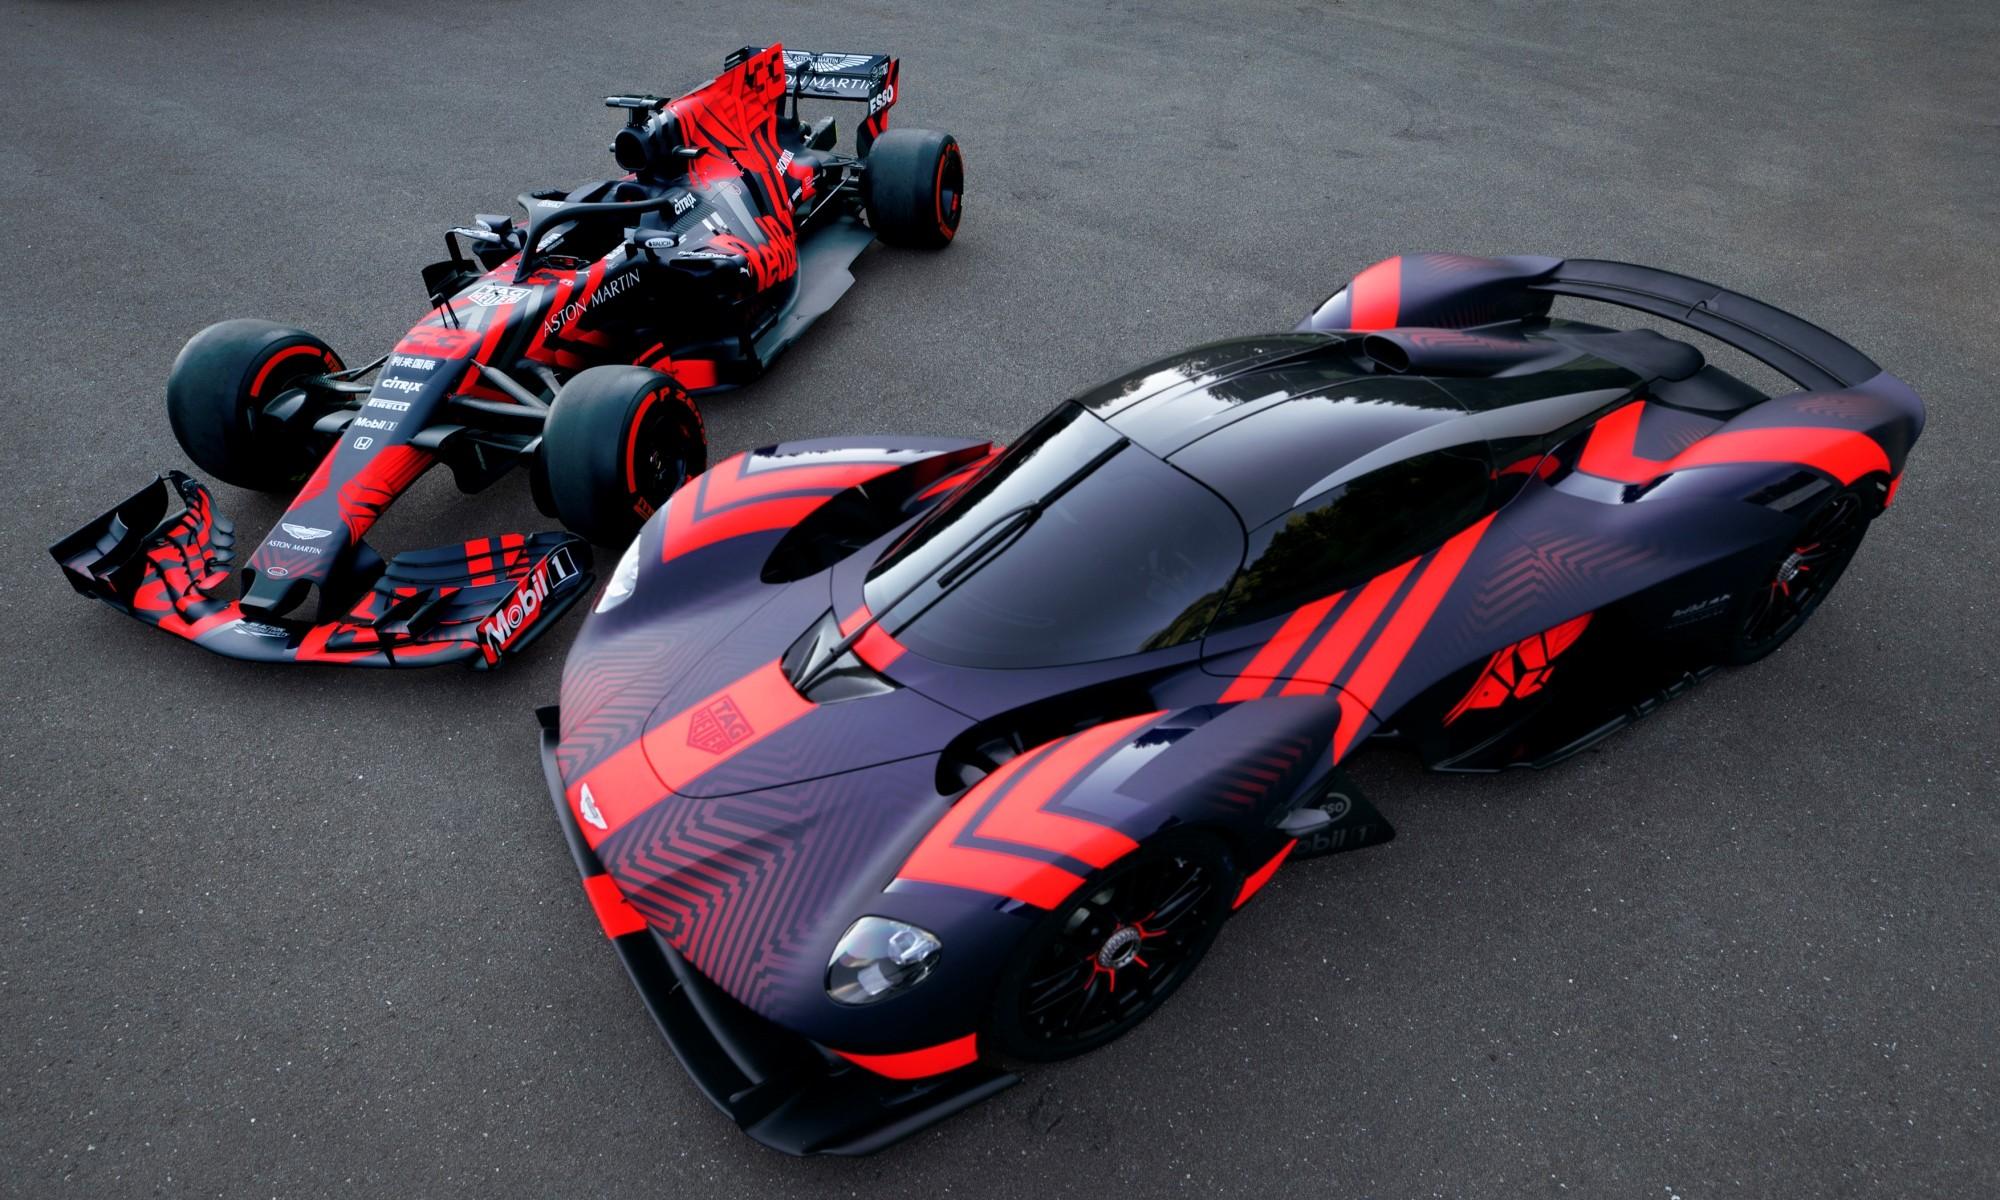 Aston Martin Valkyrie and F1 car